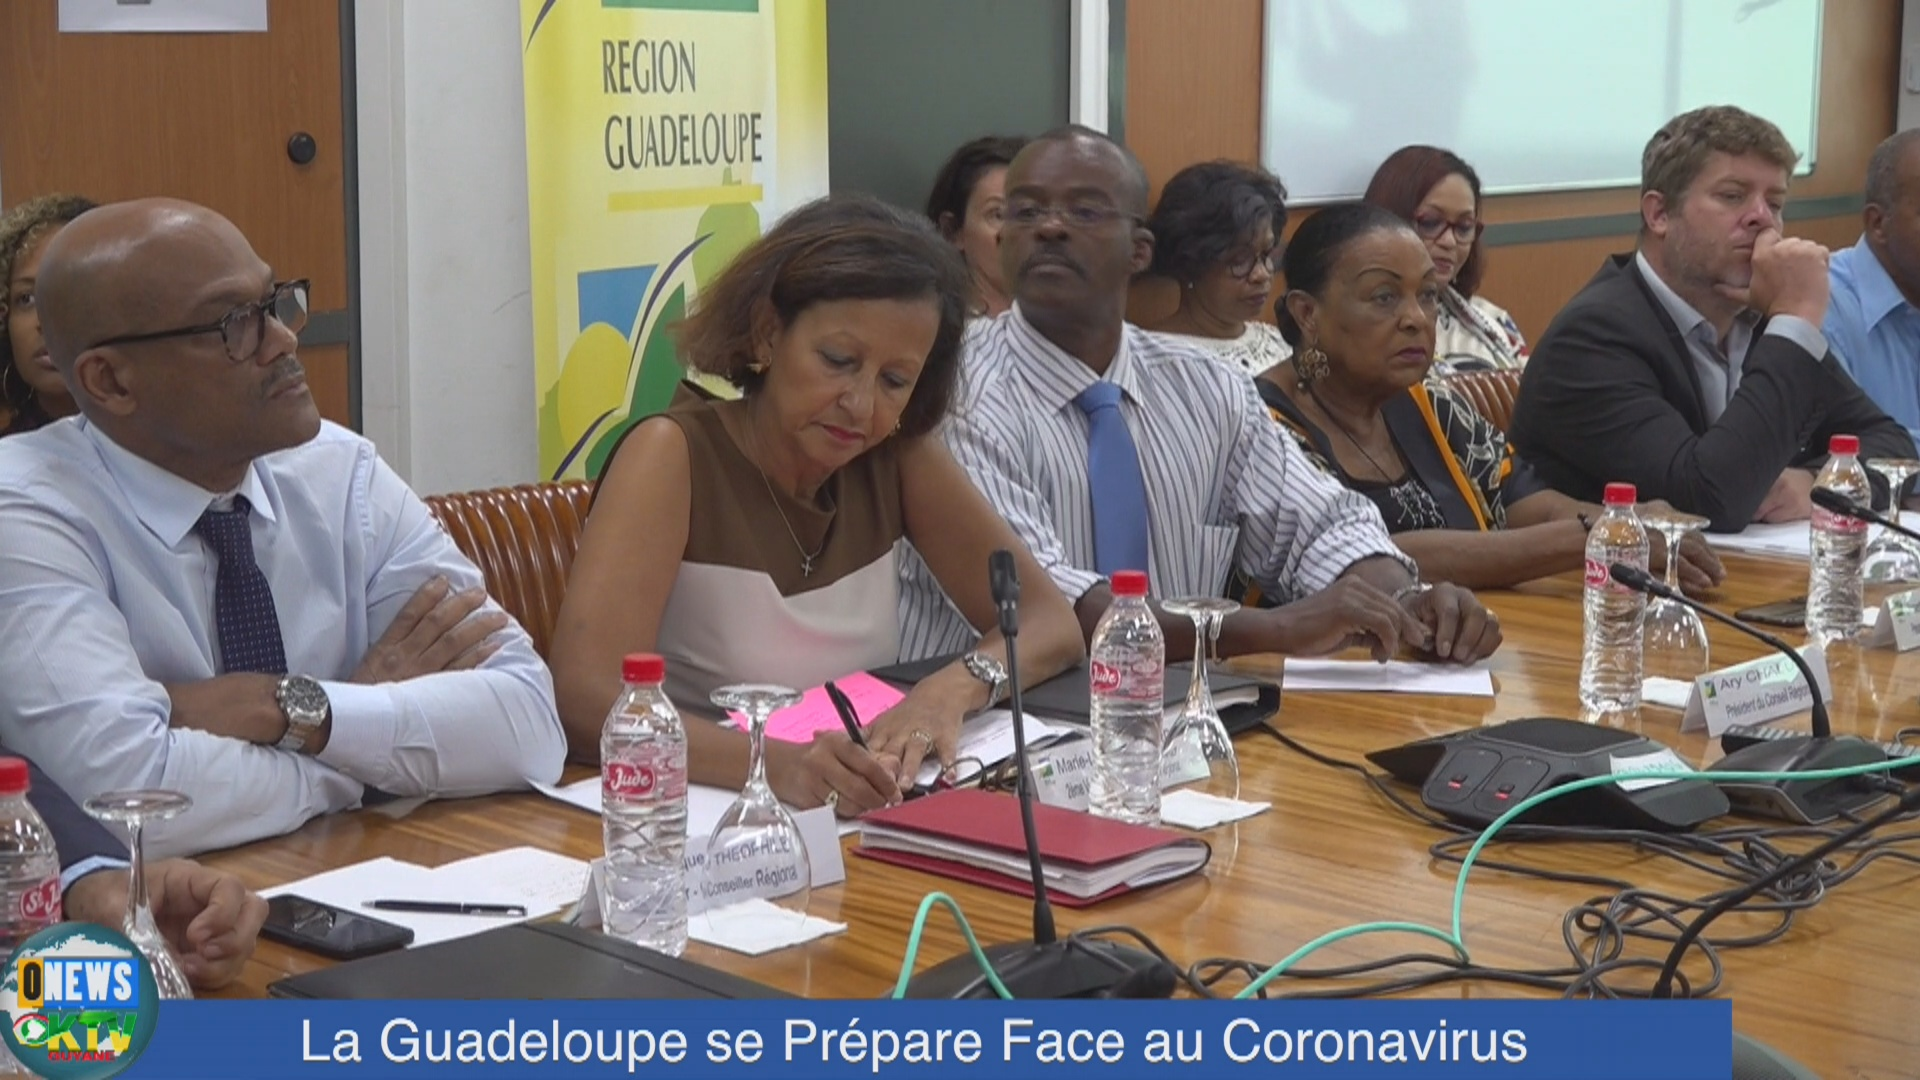 [Vidéo] La Guadeloupe se prépare face au CONORAVIRUS (Onews Guadeloupe)